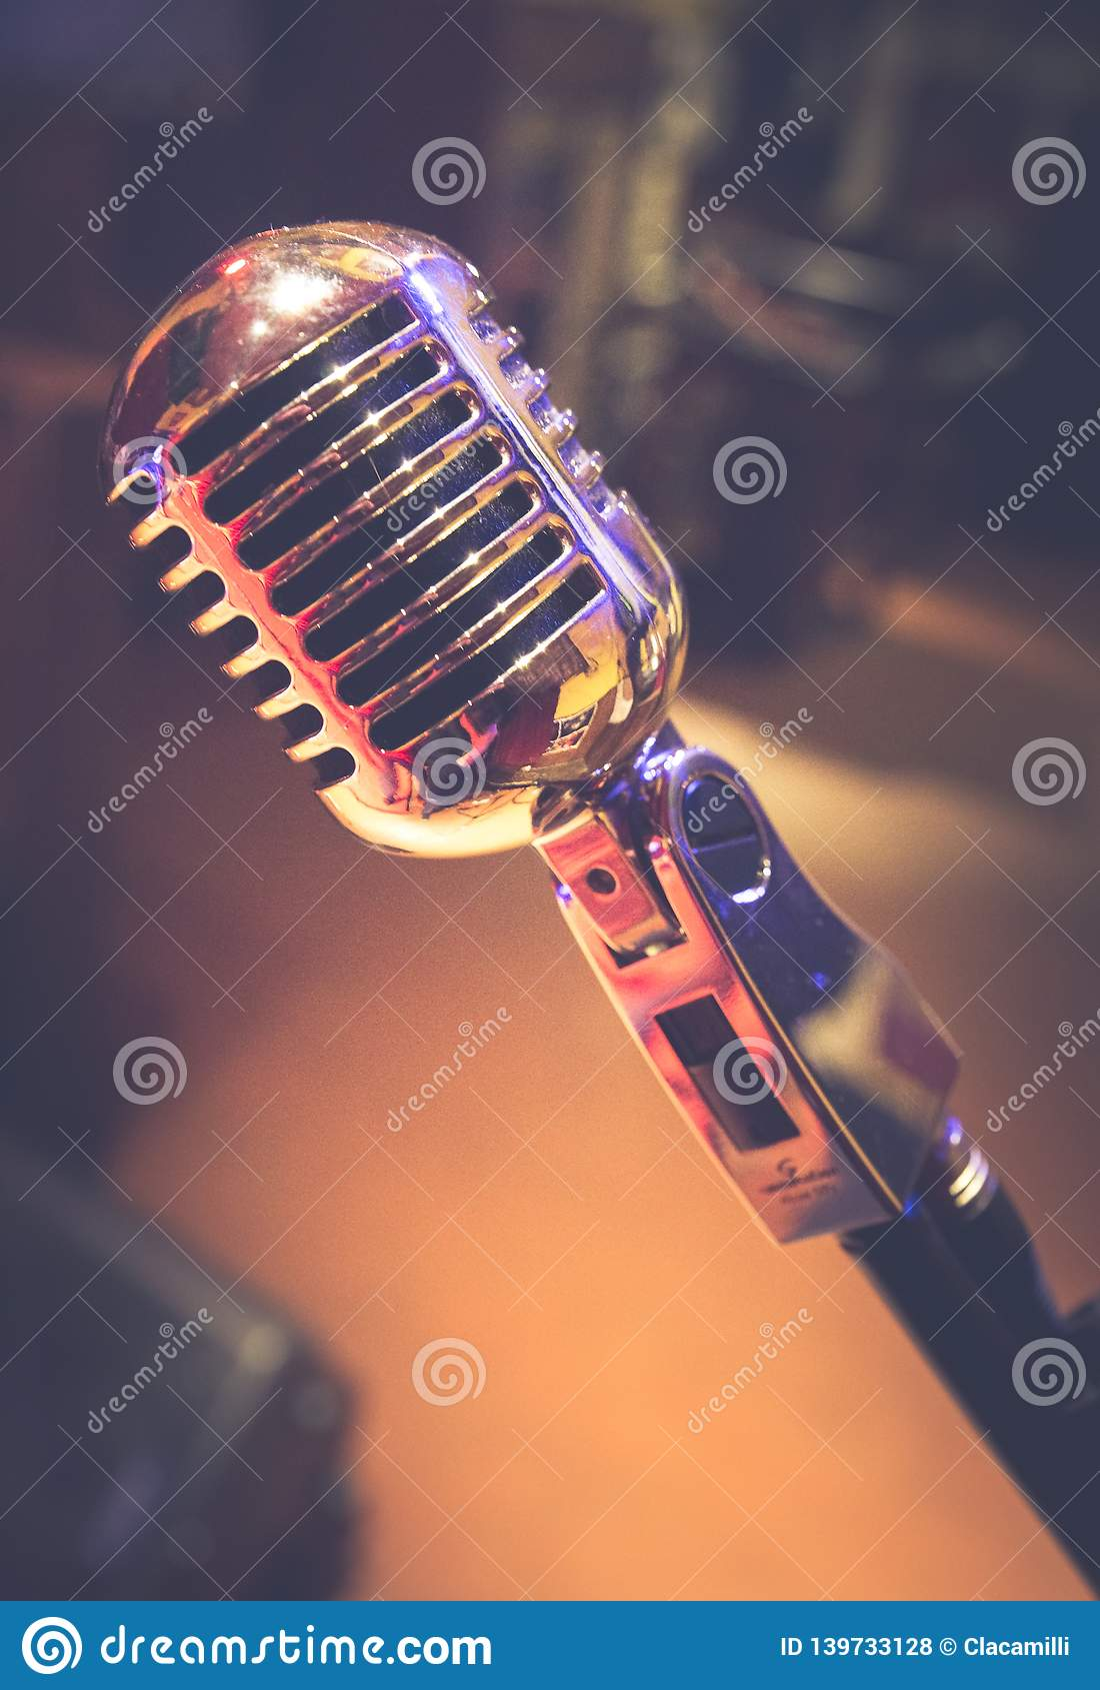 Old vintage microphone since 1950